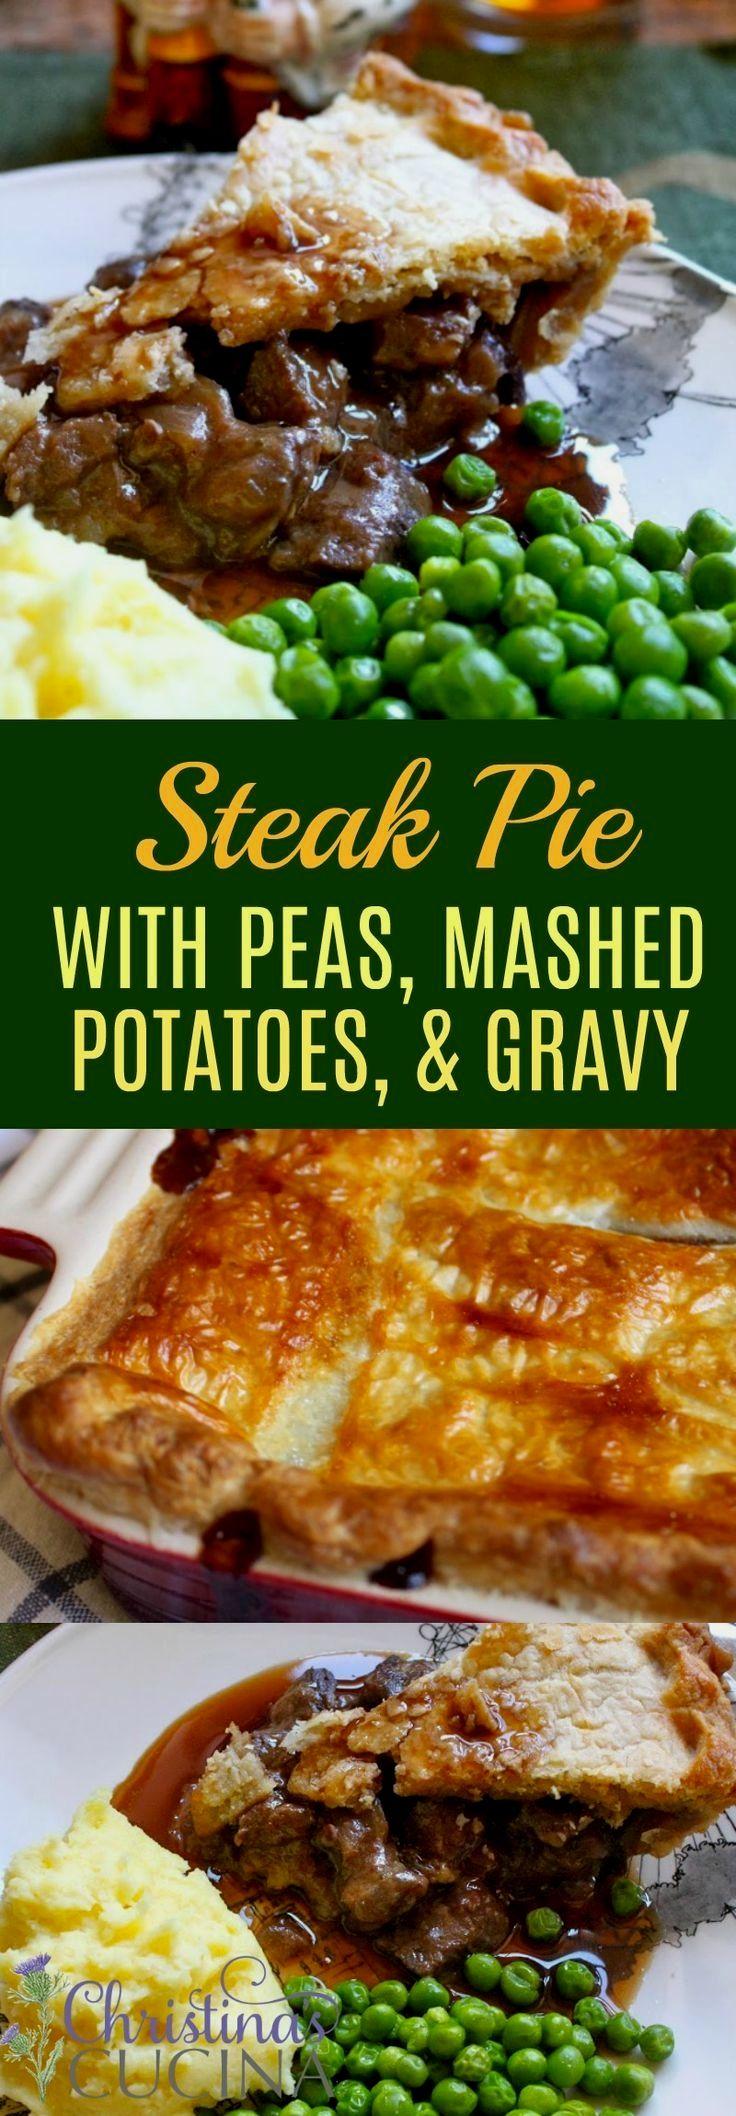 Steak pie, Meat pie recipe, Beef recipes